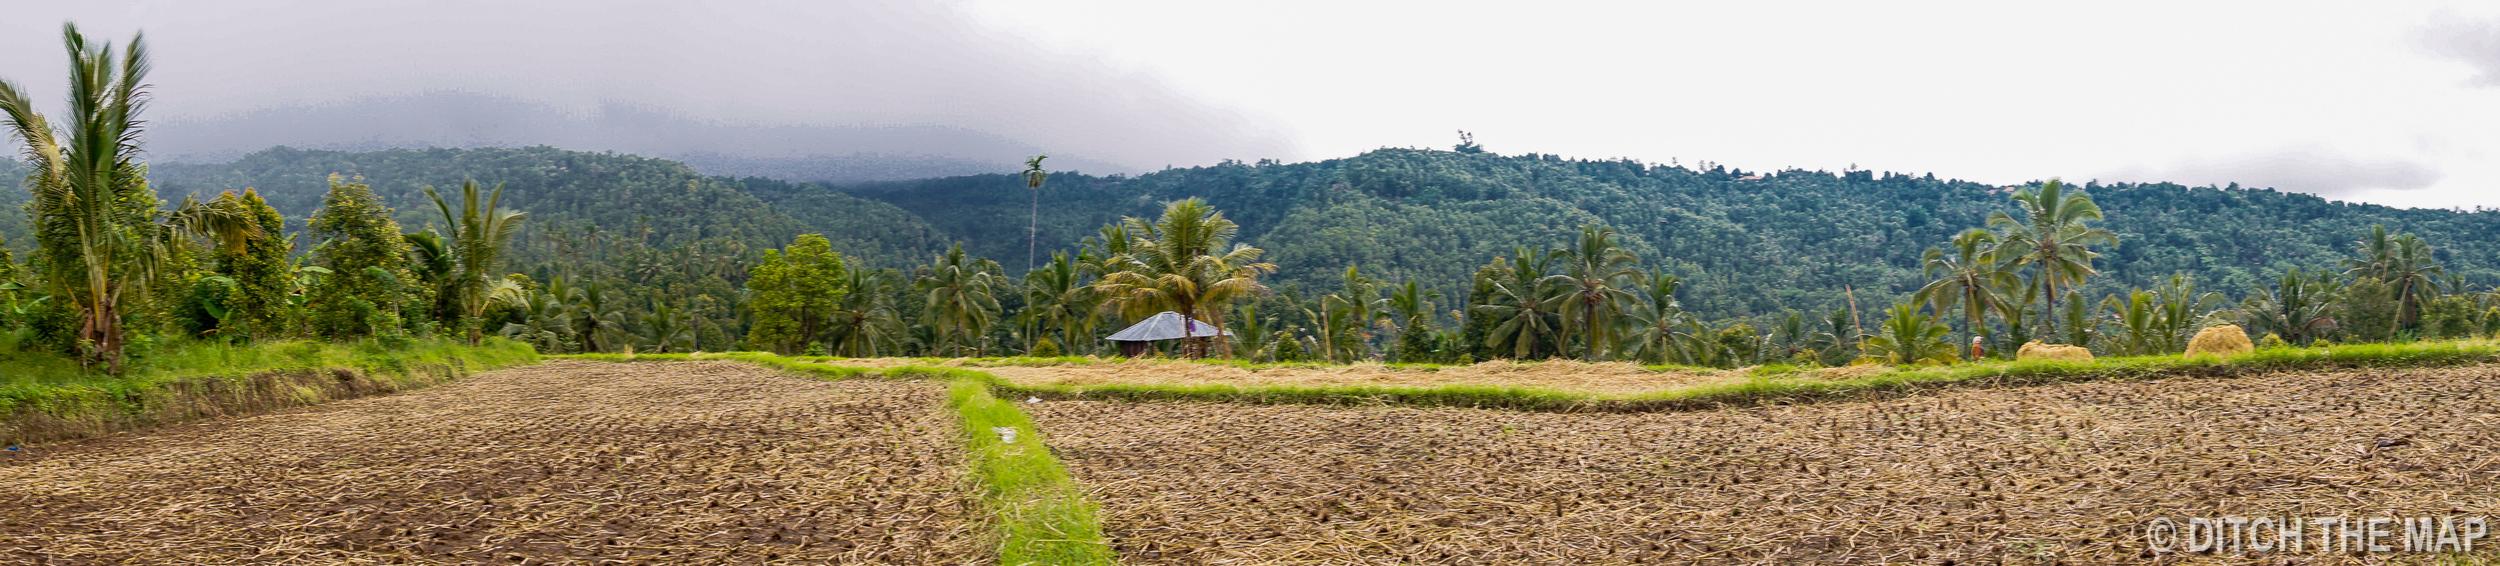 Rice Fields in Munduk, Bali